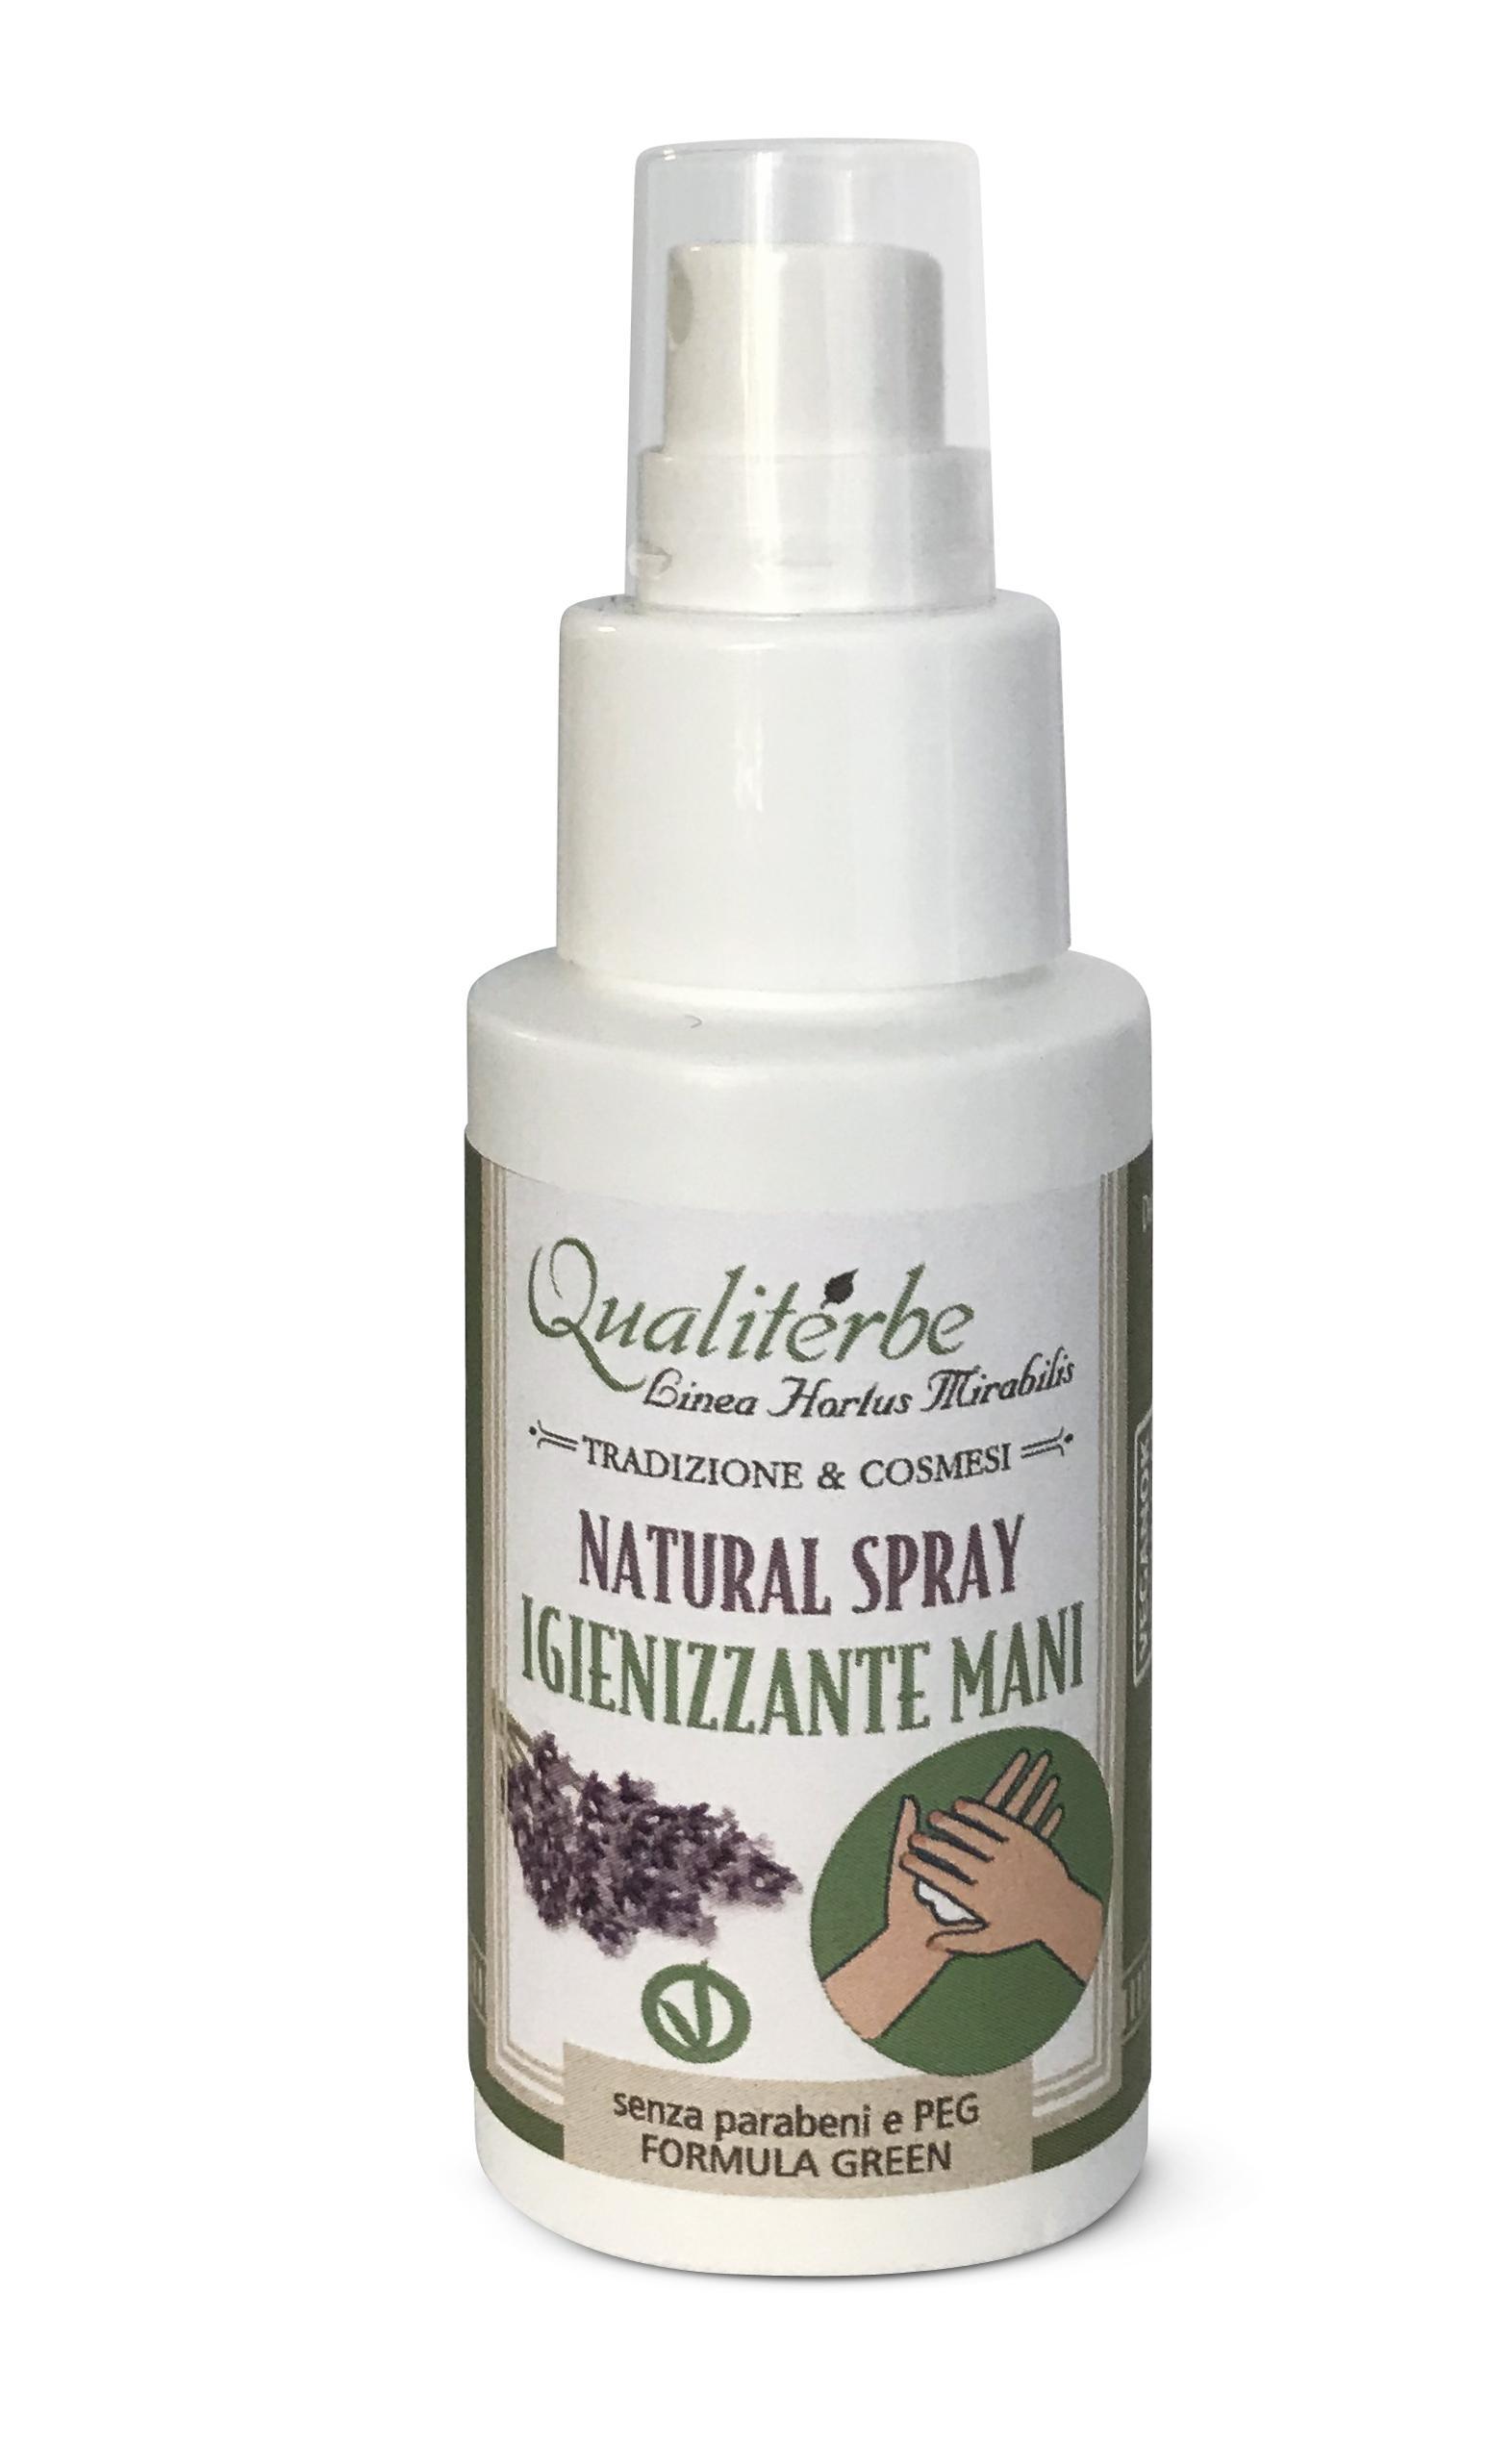 Igienizzante mani Spray 100% Naturale by Qualiterbe